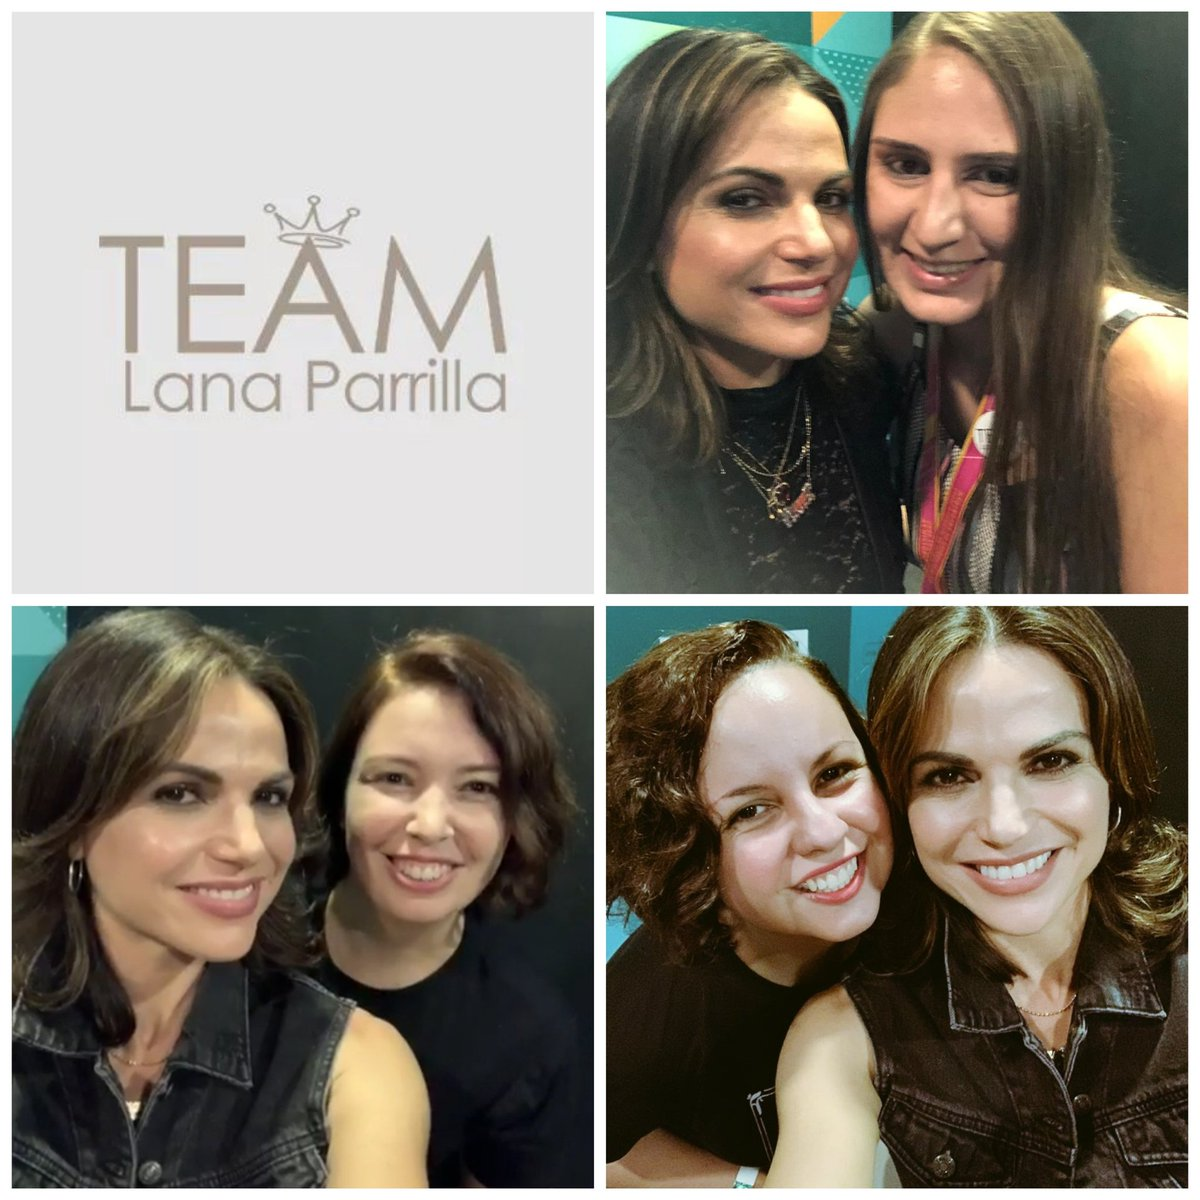 Team Lana Parrilla Teamlparrilla Twitter Of italian and puerto rican descent, lana parrilla spent her childhood in brooklyn, new york. team lana parrilla teamlparrilla